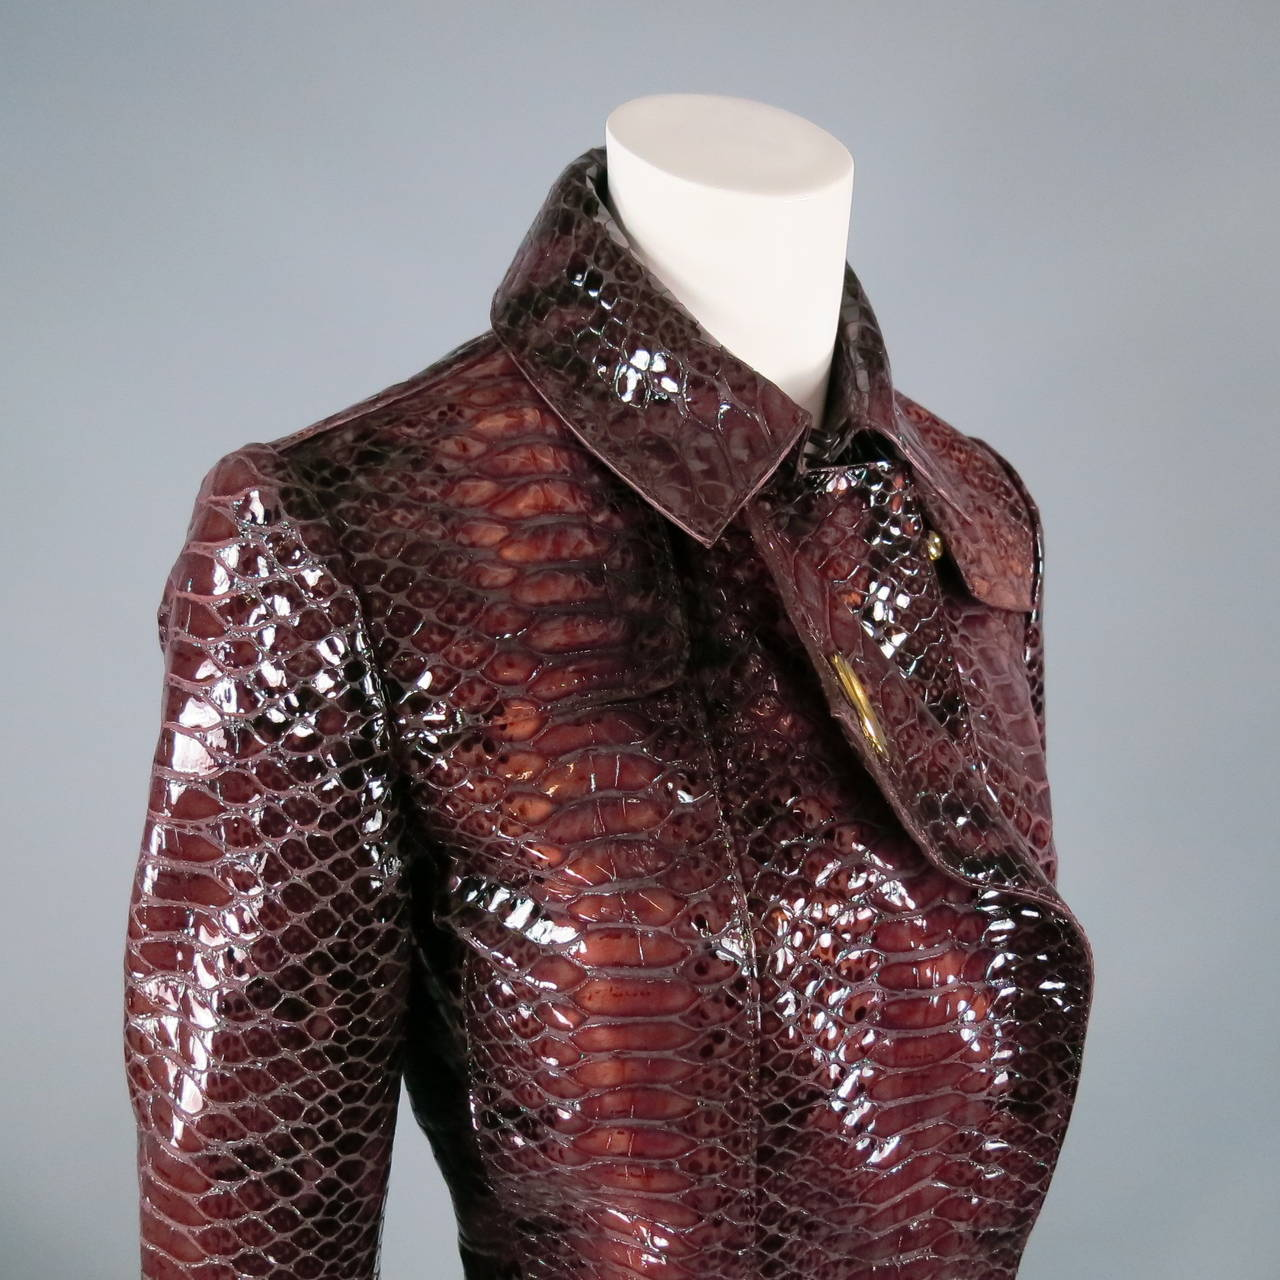 2013's BURBERRY PRORSUM Size 4 Burgundy Python Embossed Patent Leather Jacket 4